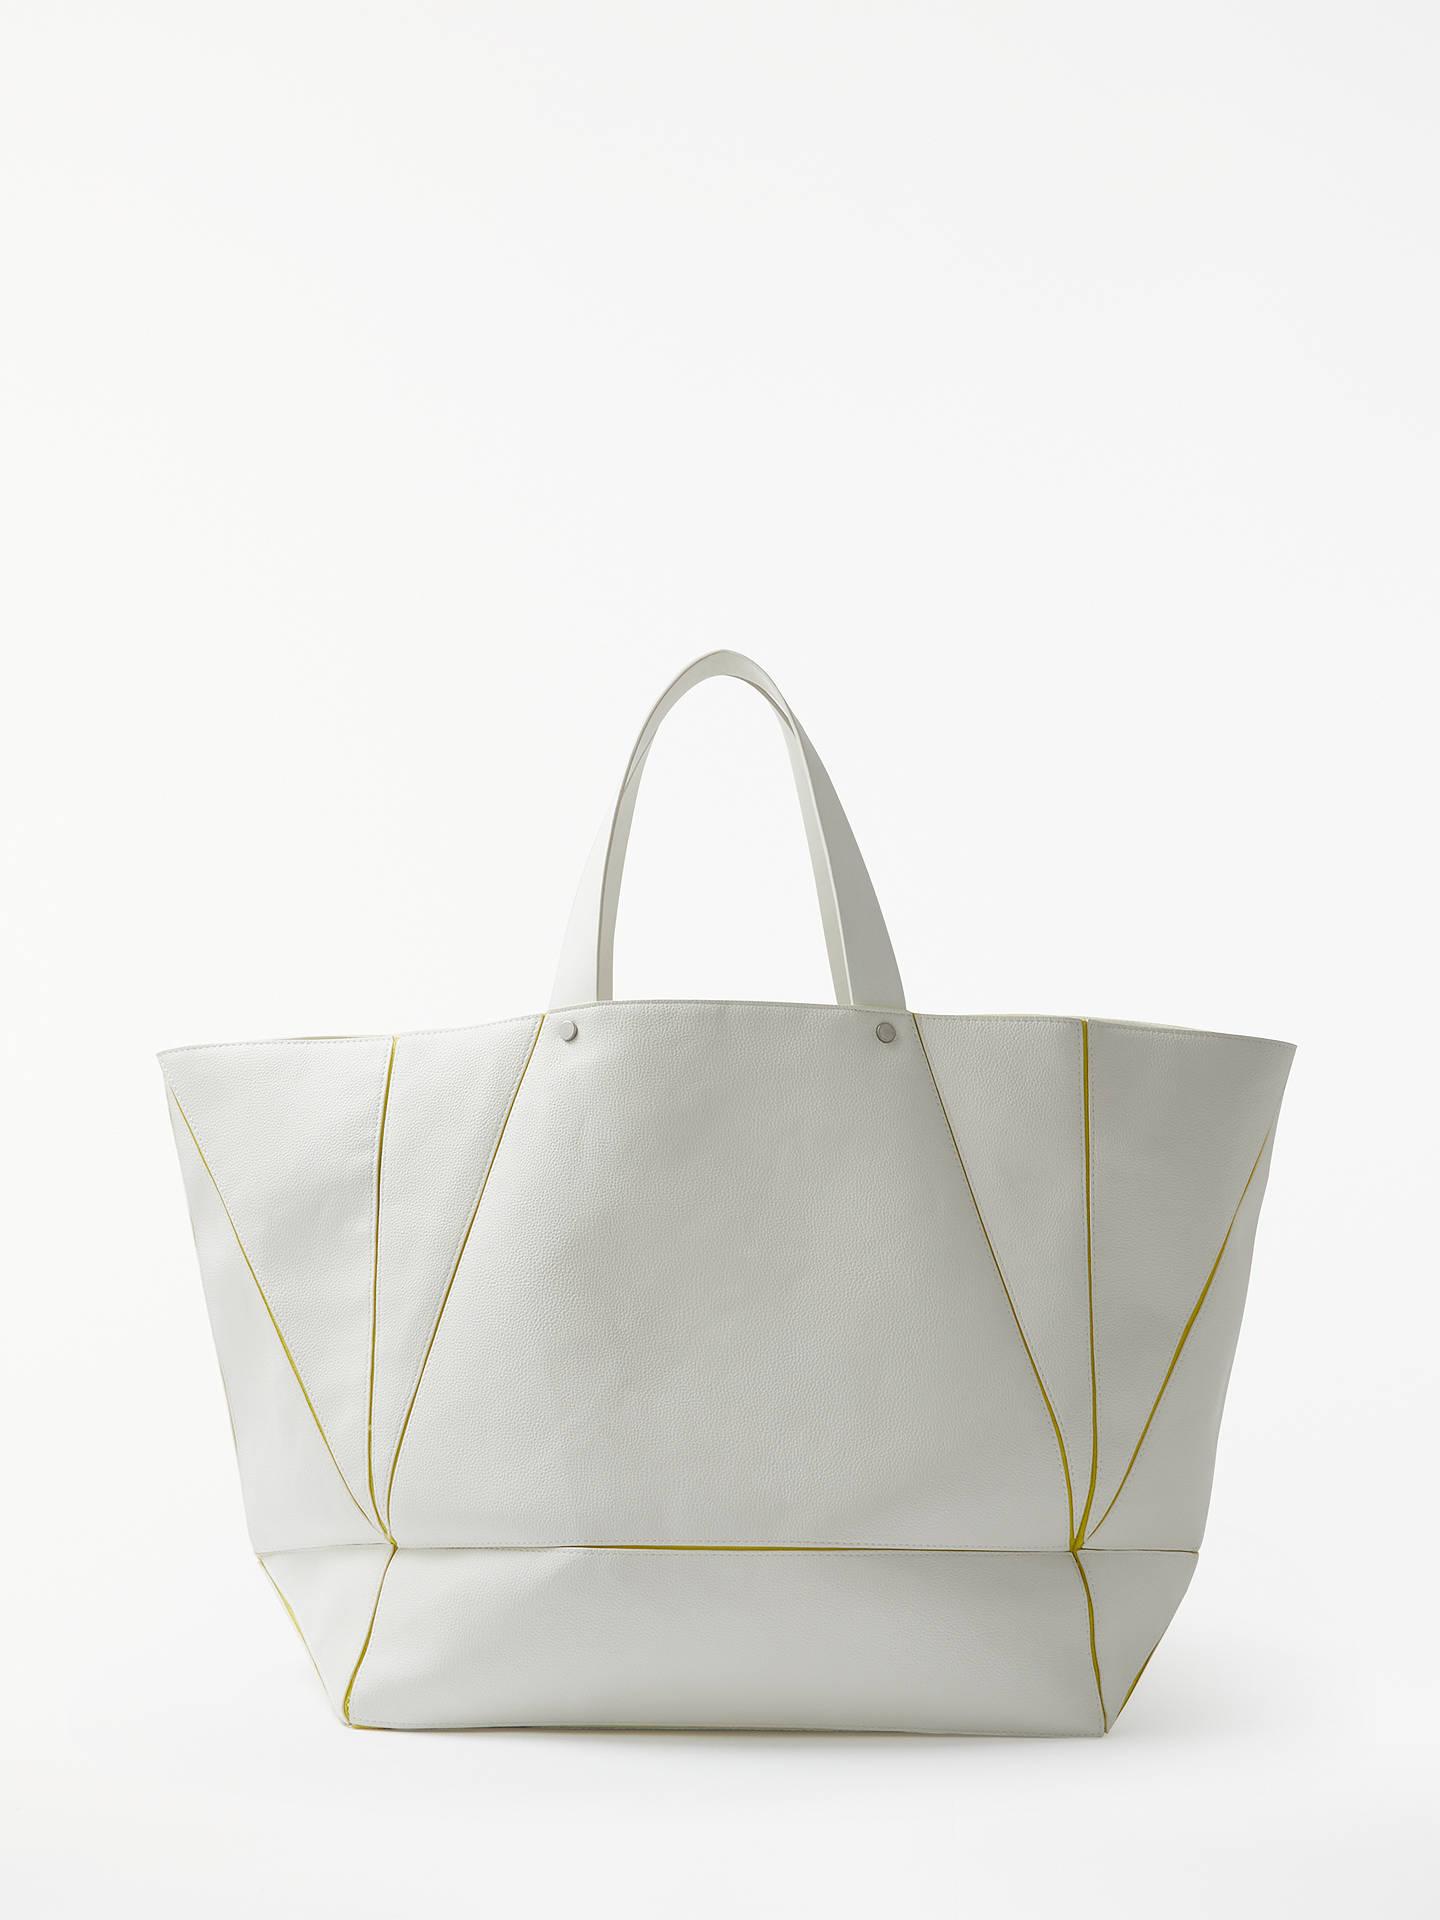 Kin Kyoto Origami Tote Bag White Online At Johnlewis